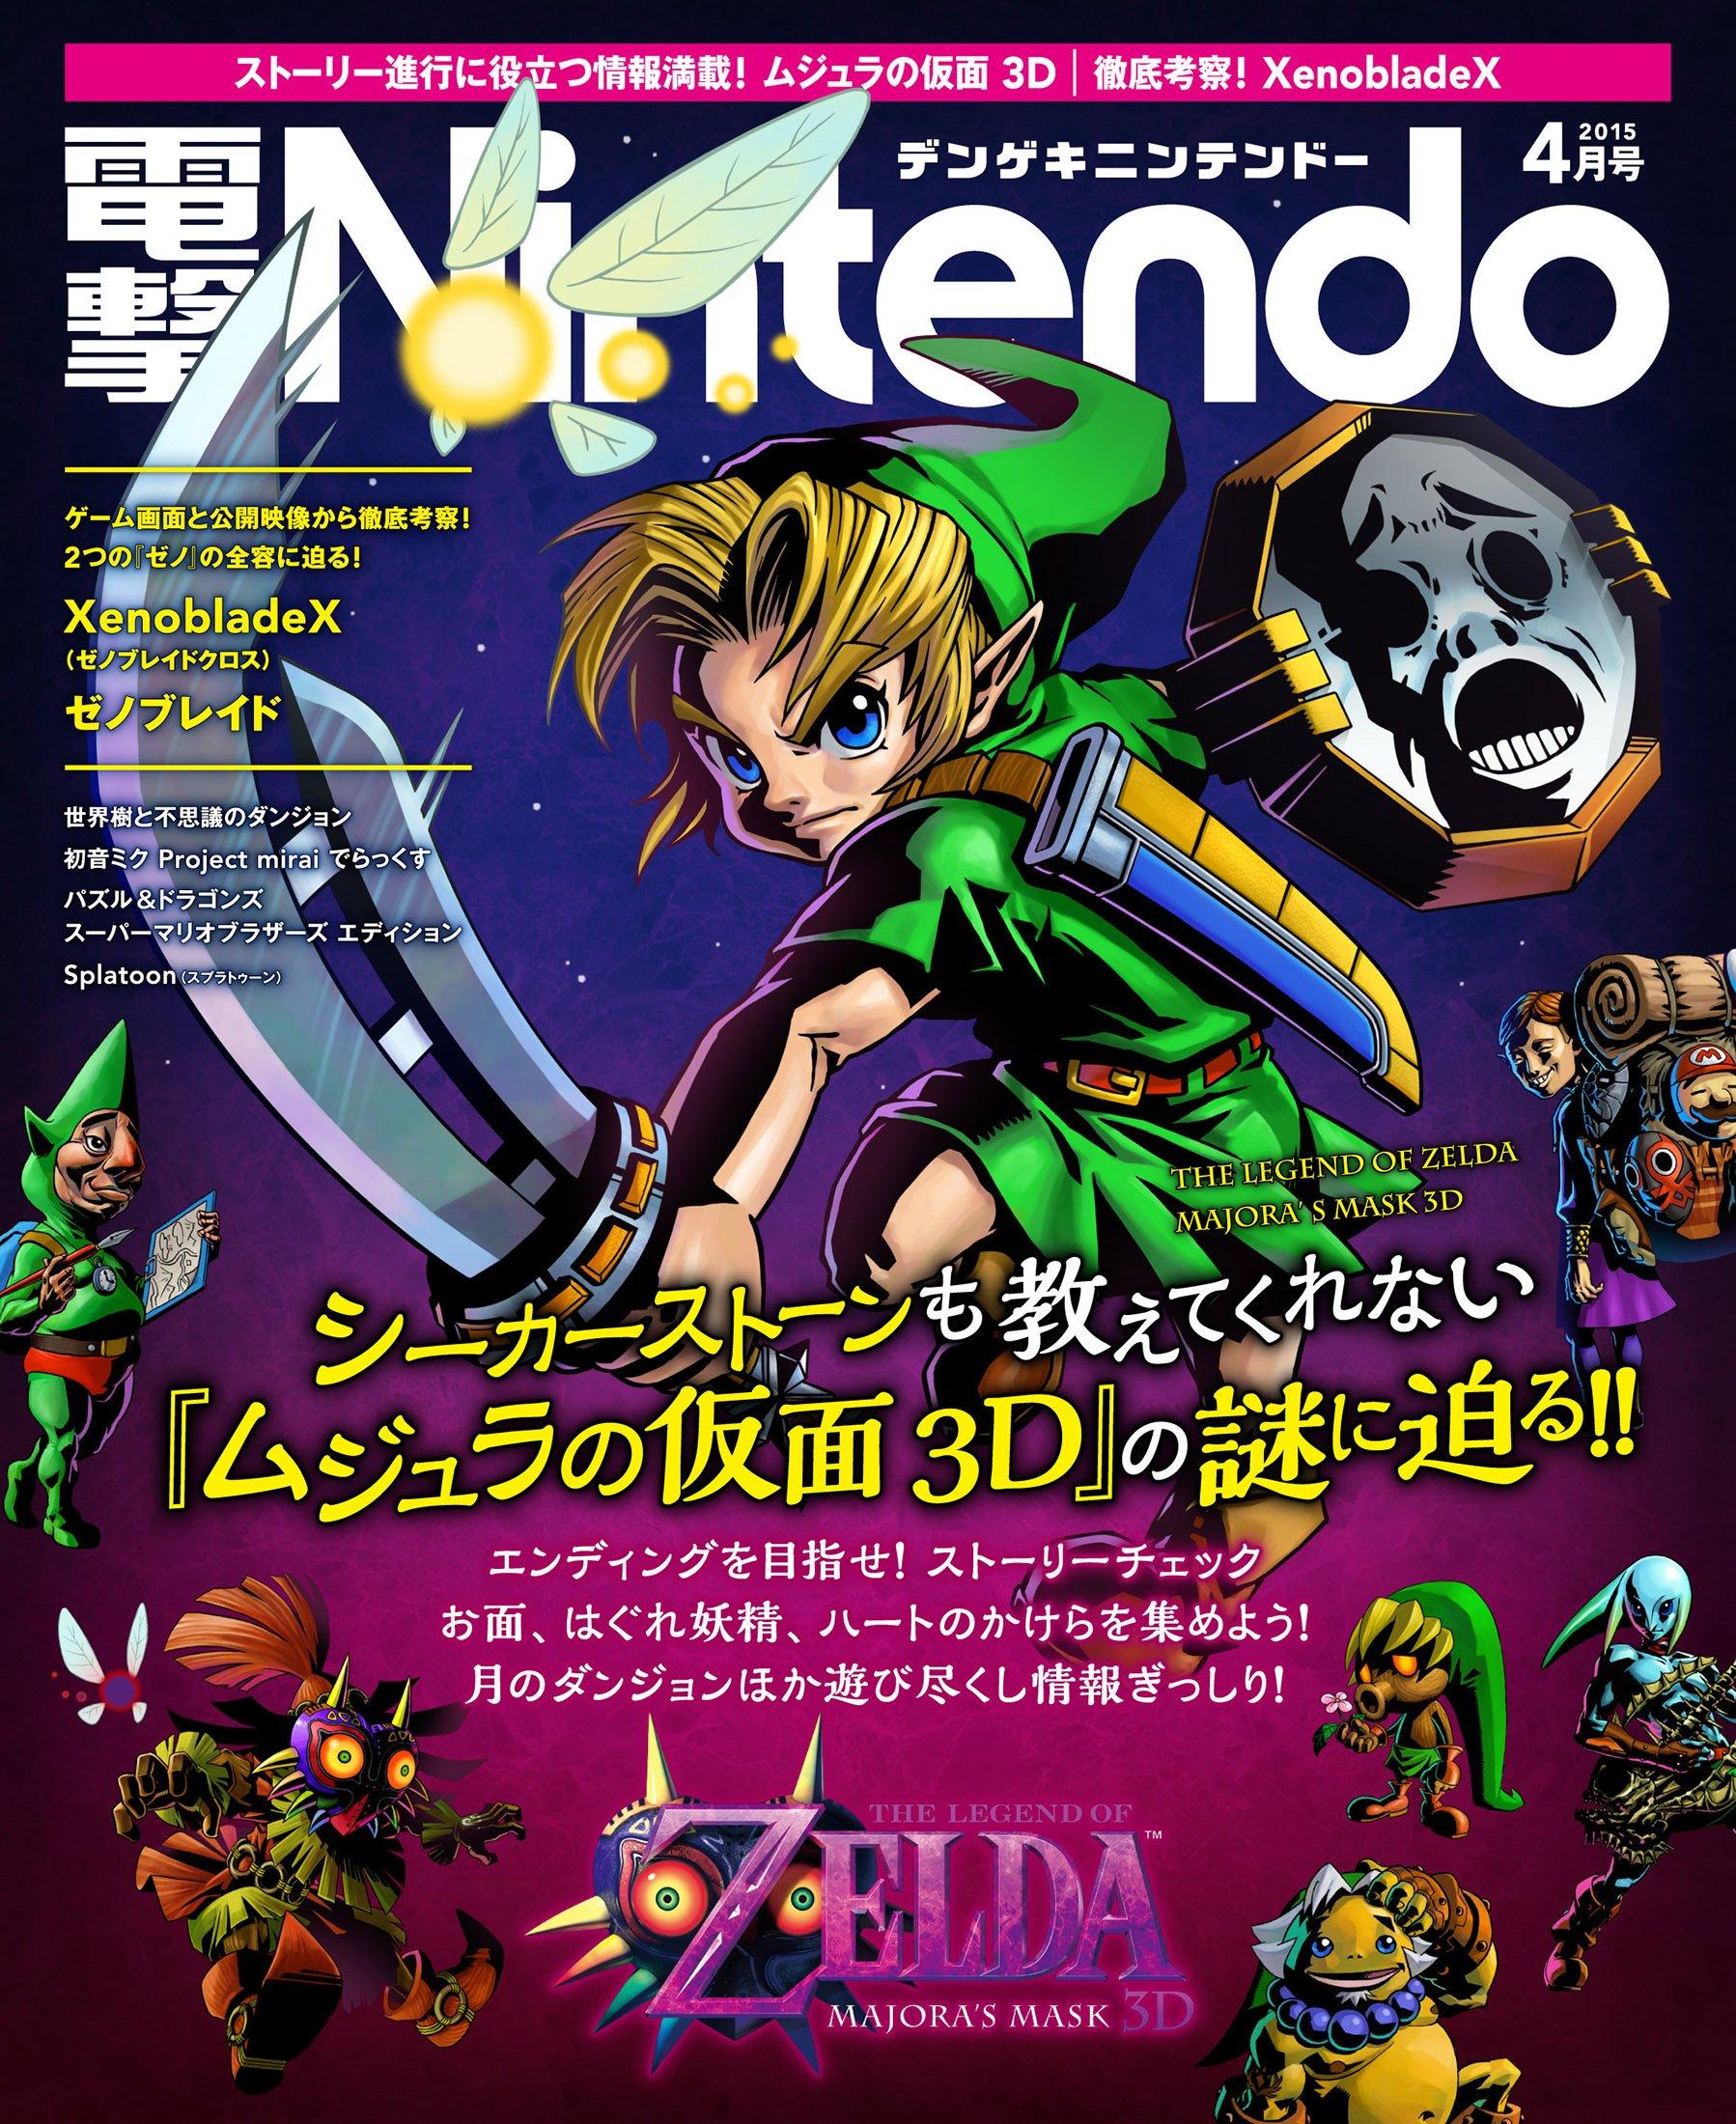 Dengeki Nintendo Issue 023 (April 2015)